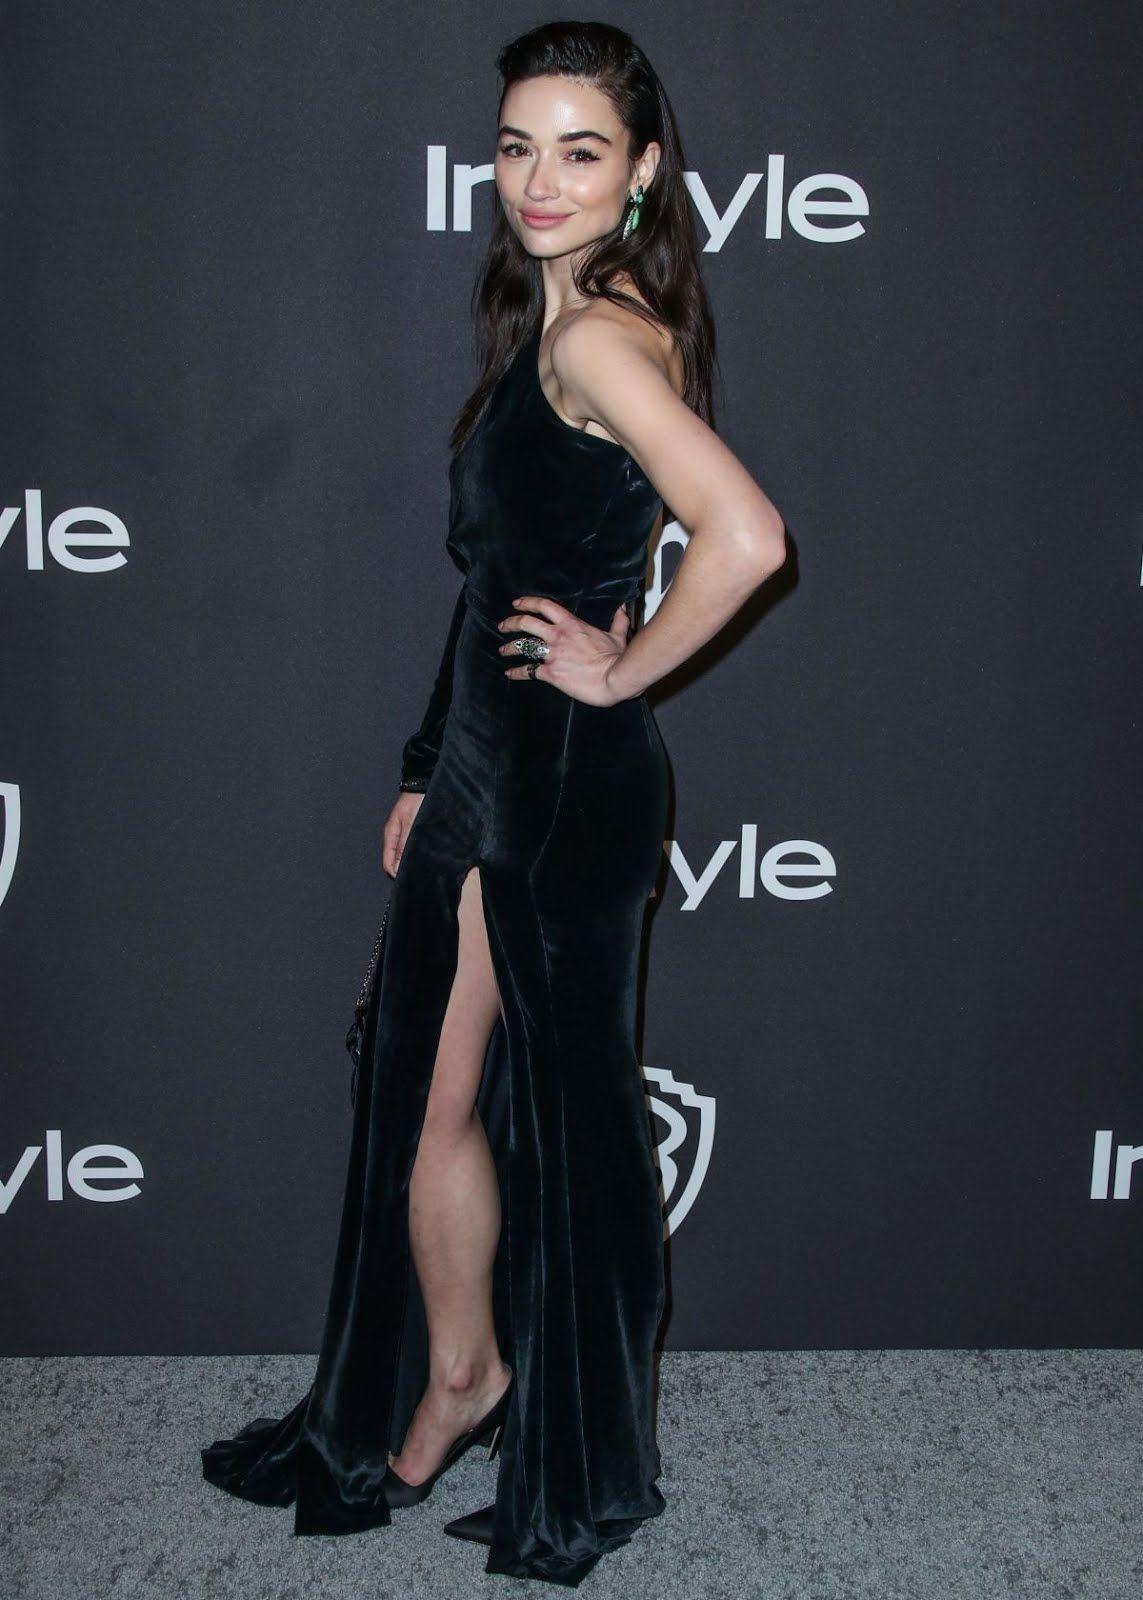 2019 Golden Globe Awards Crystal Reed in black dress